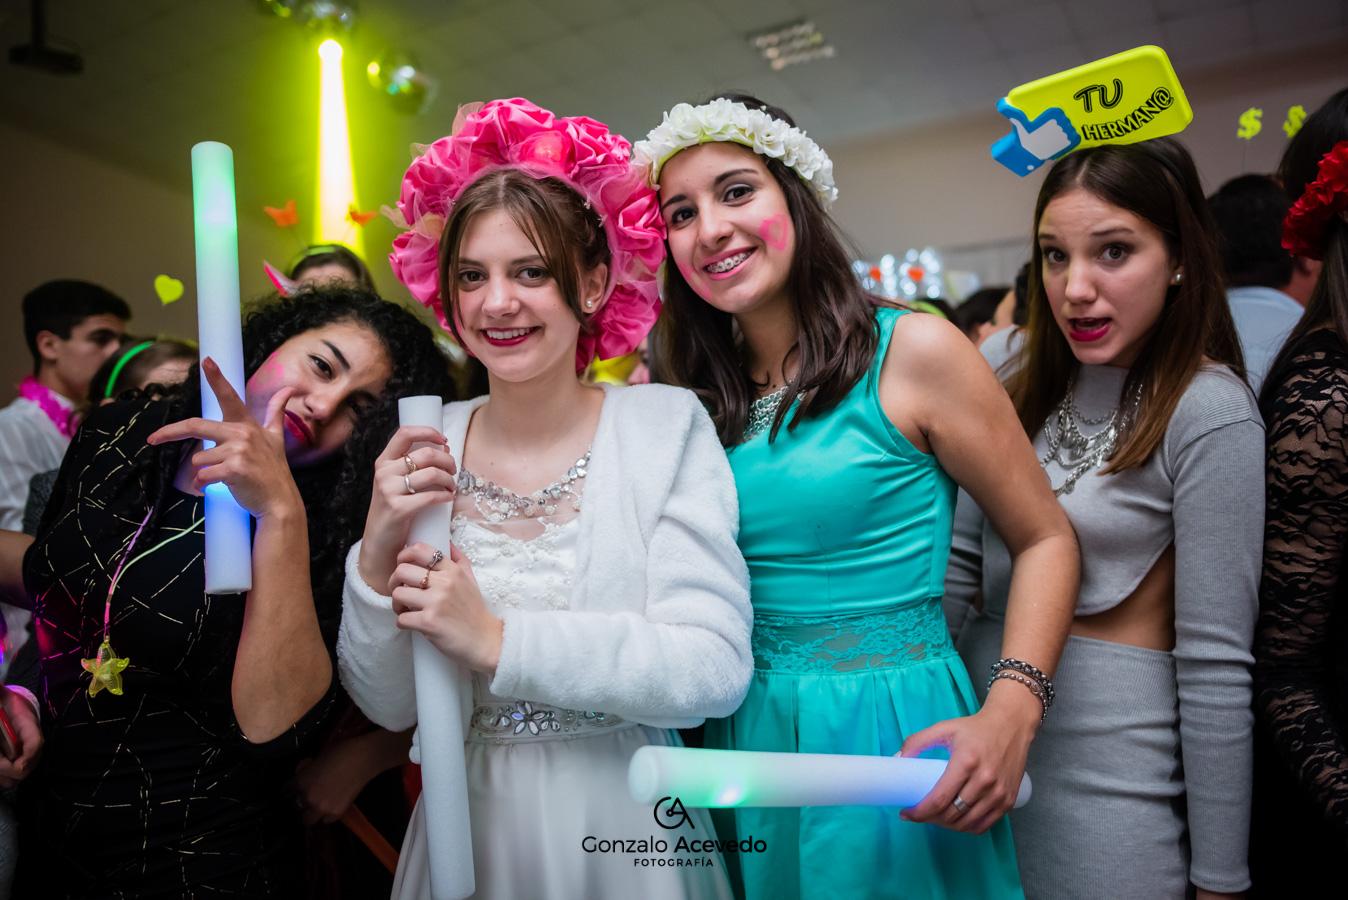 58-maru-fiesta-evento-cumpleanos-15-an-lorena-nobile-nancy-cergneux-entre-rios-salones-gonzalo-acevedo-fotografia